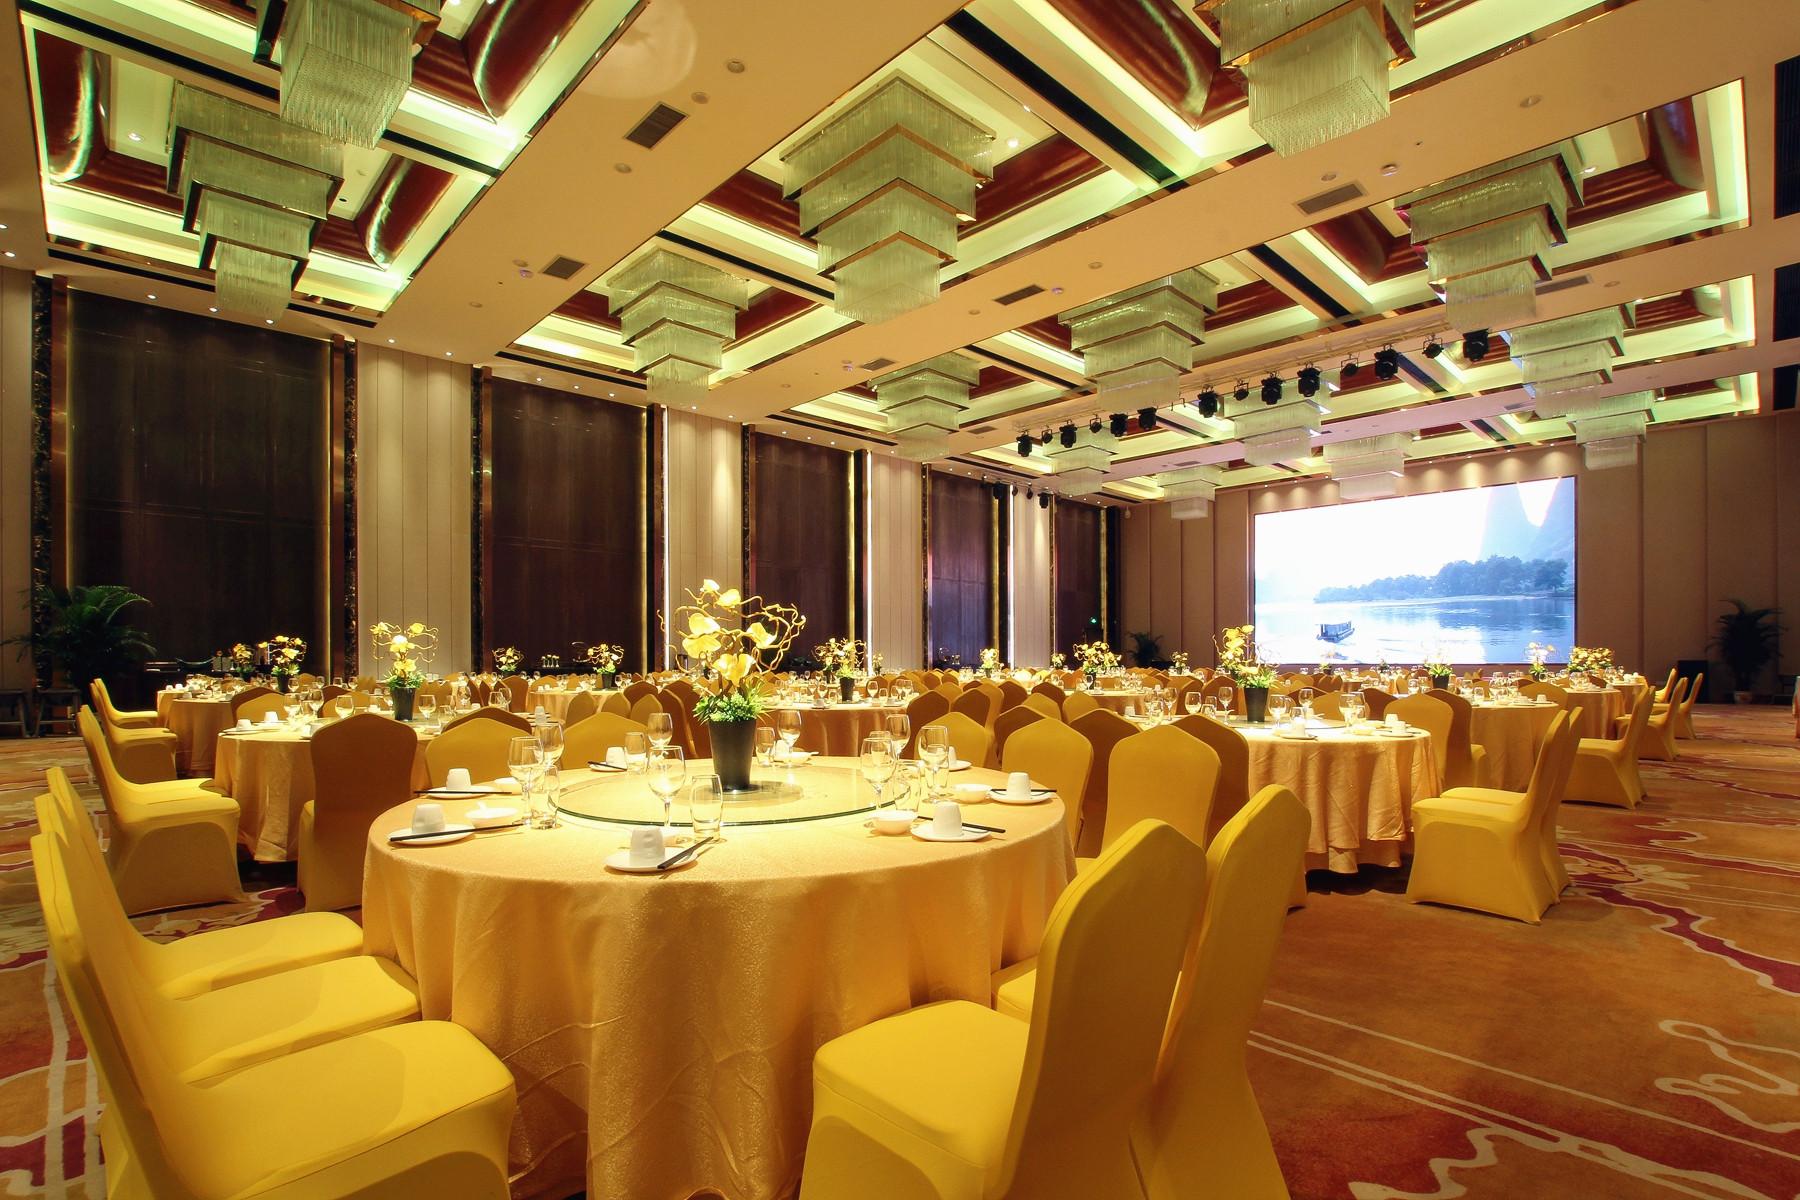 Royal Garden - BANQUET - Guilin Exhibition International Hotel-The ...